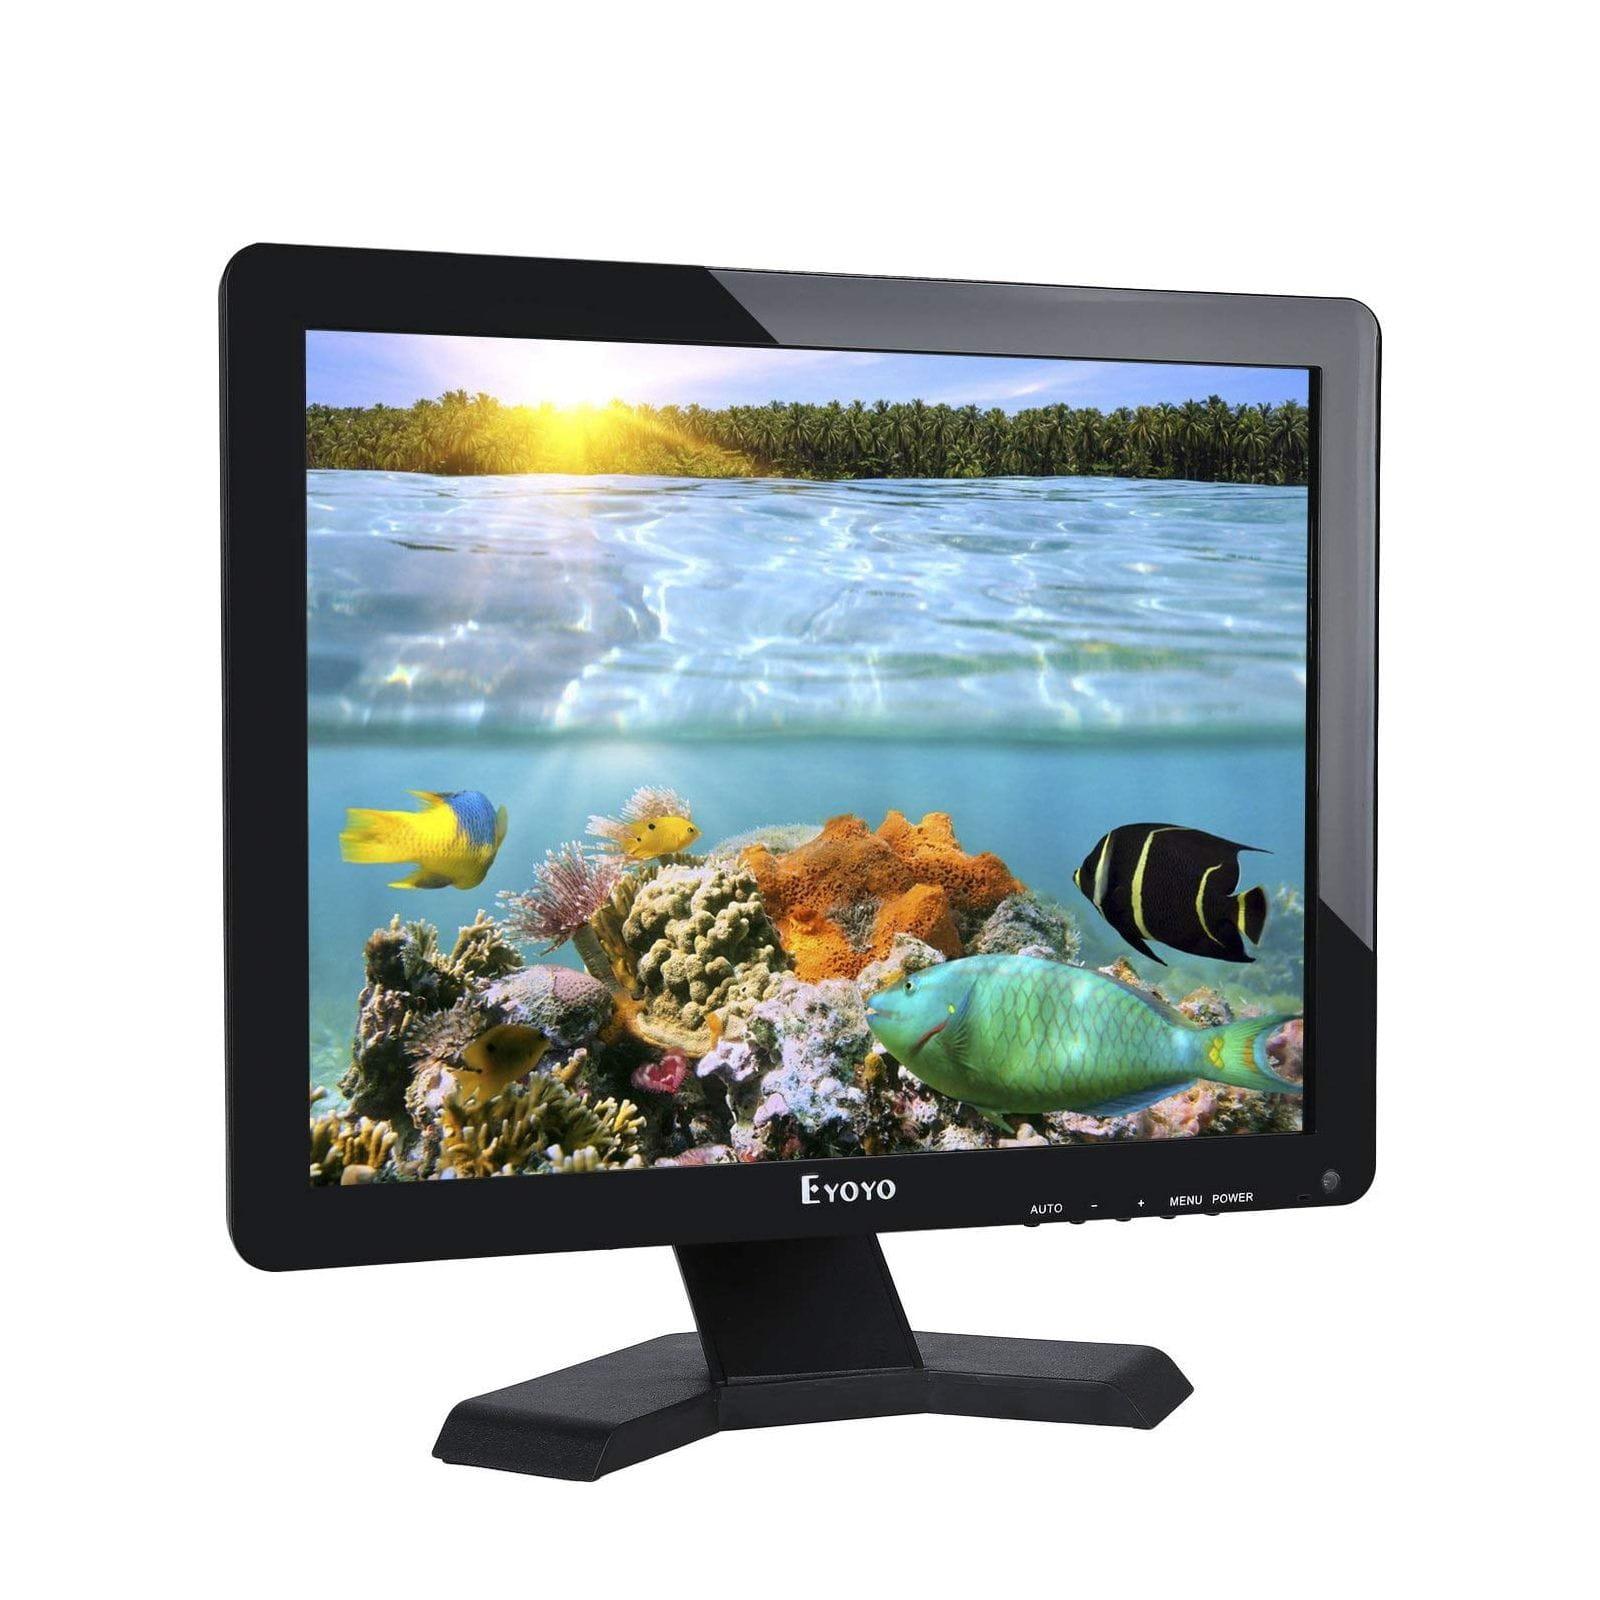 ECRAN BNC 17 POUCES AVEC HDMI VGA 1080P